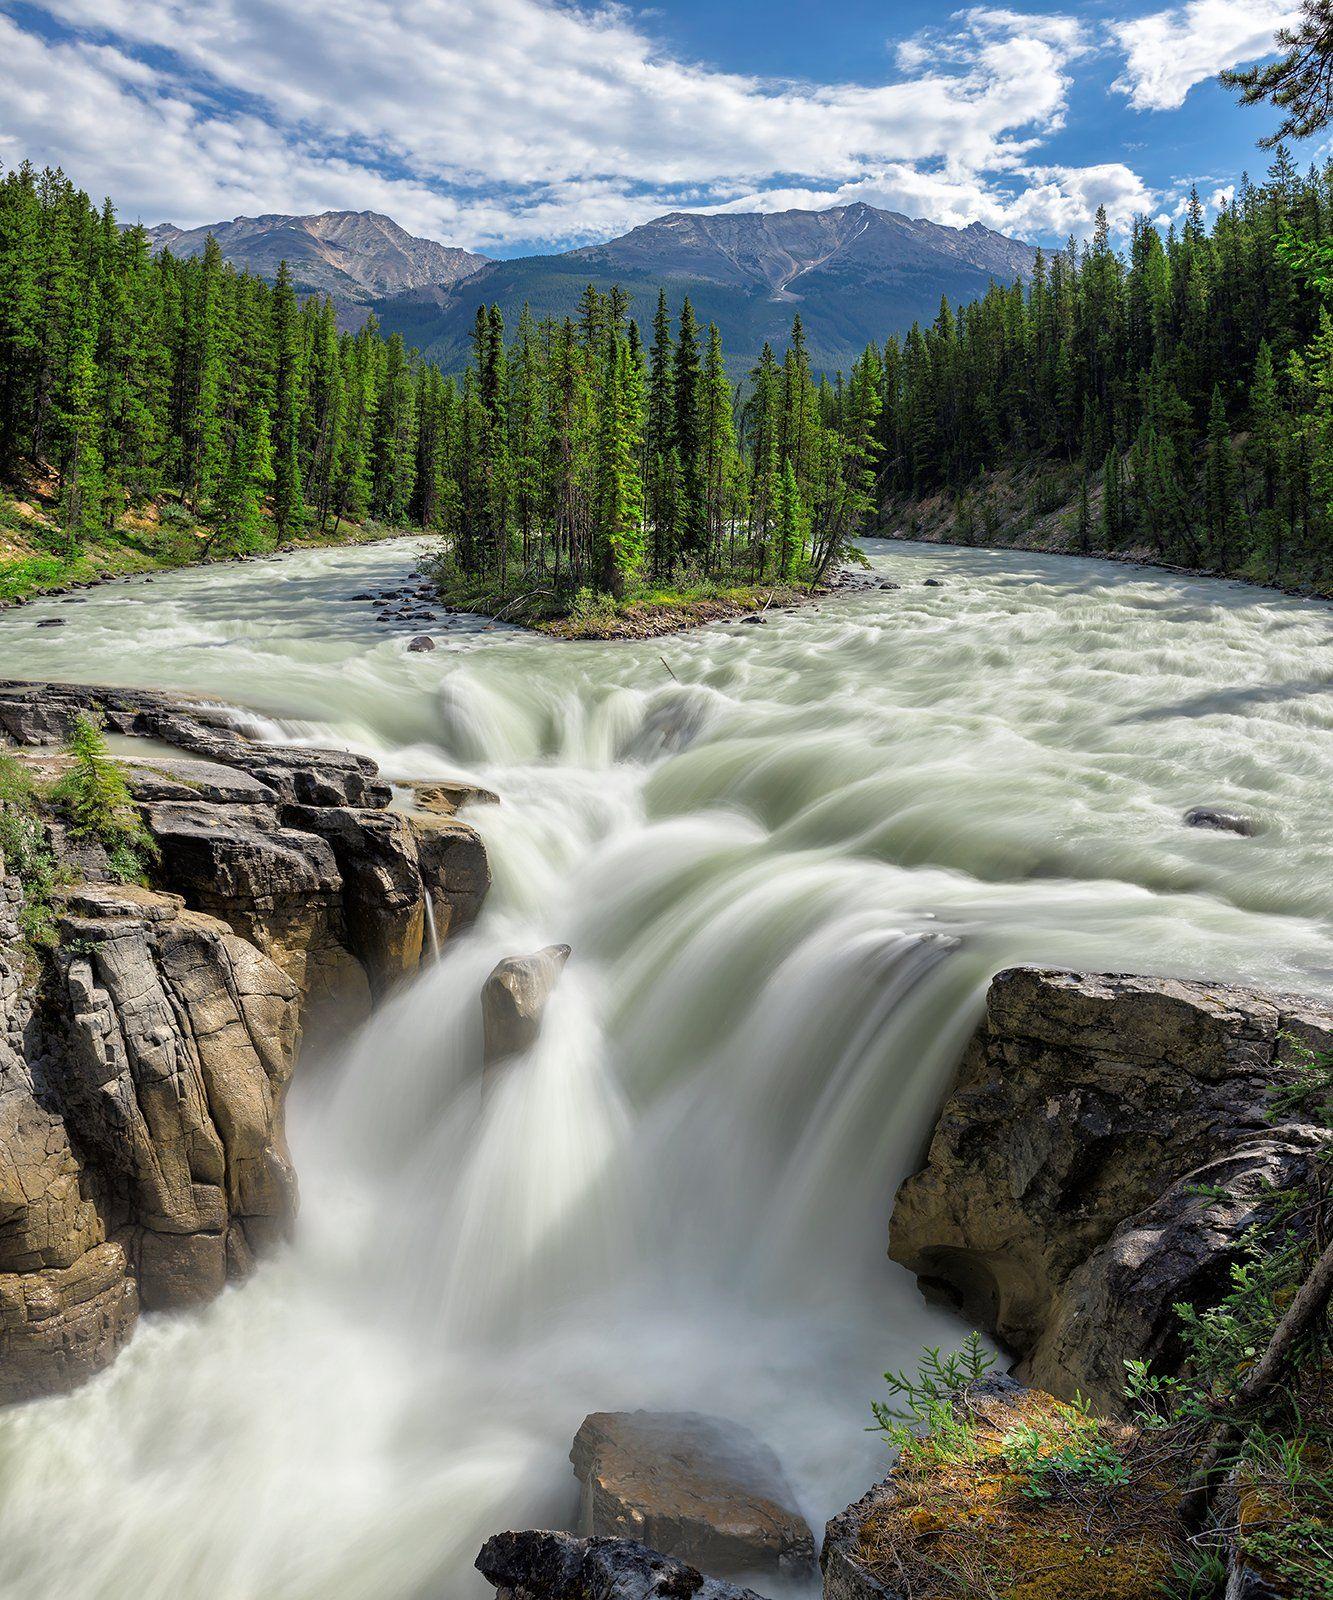 Canadian Rockies, Jasper, National, Park, Rocky Mountains, Alberta, Canada, Sunwapta, falls, Banff,  island, forest, mountain, Waterfall, Athabaska, river, , Dmitry Vinogradov